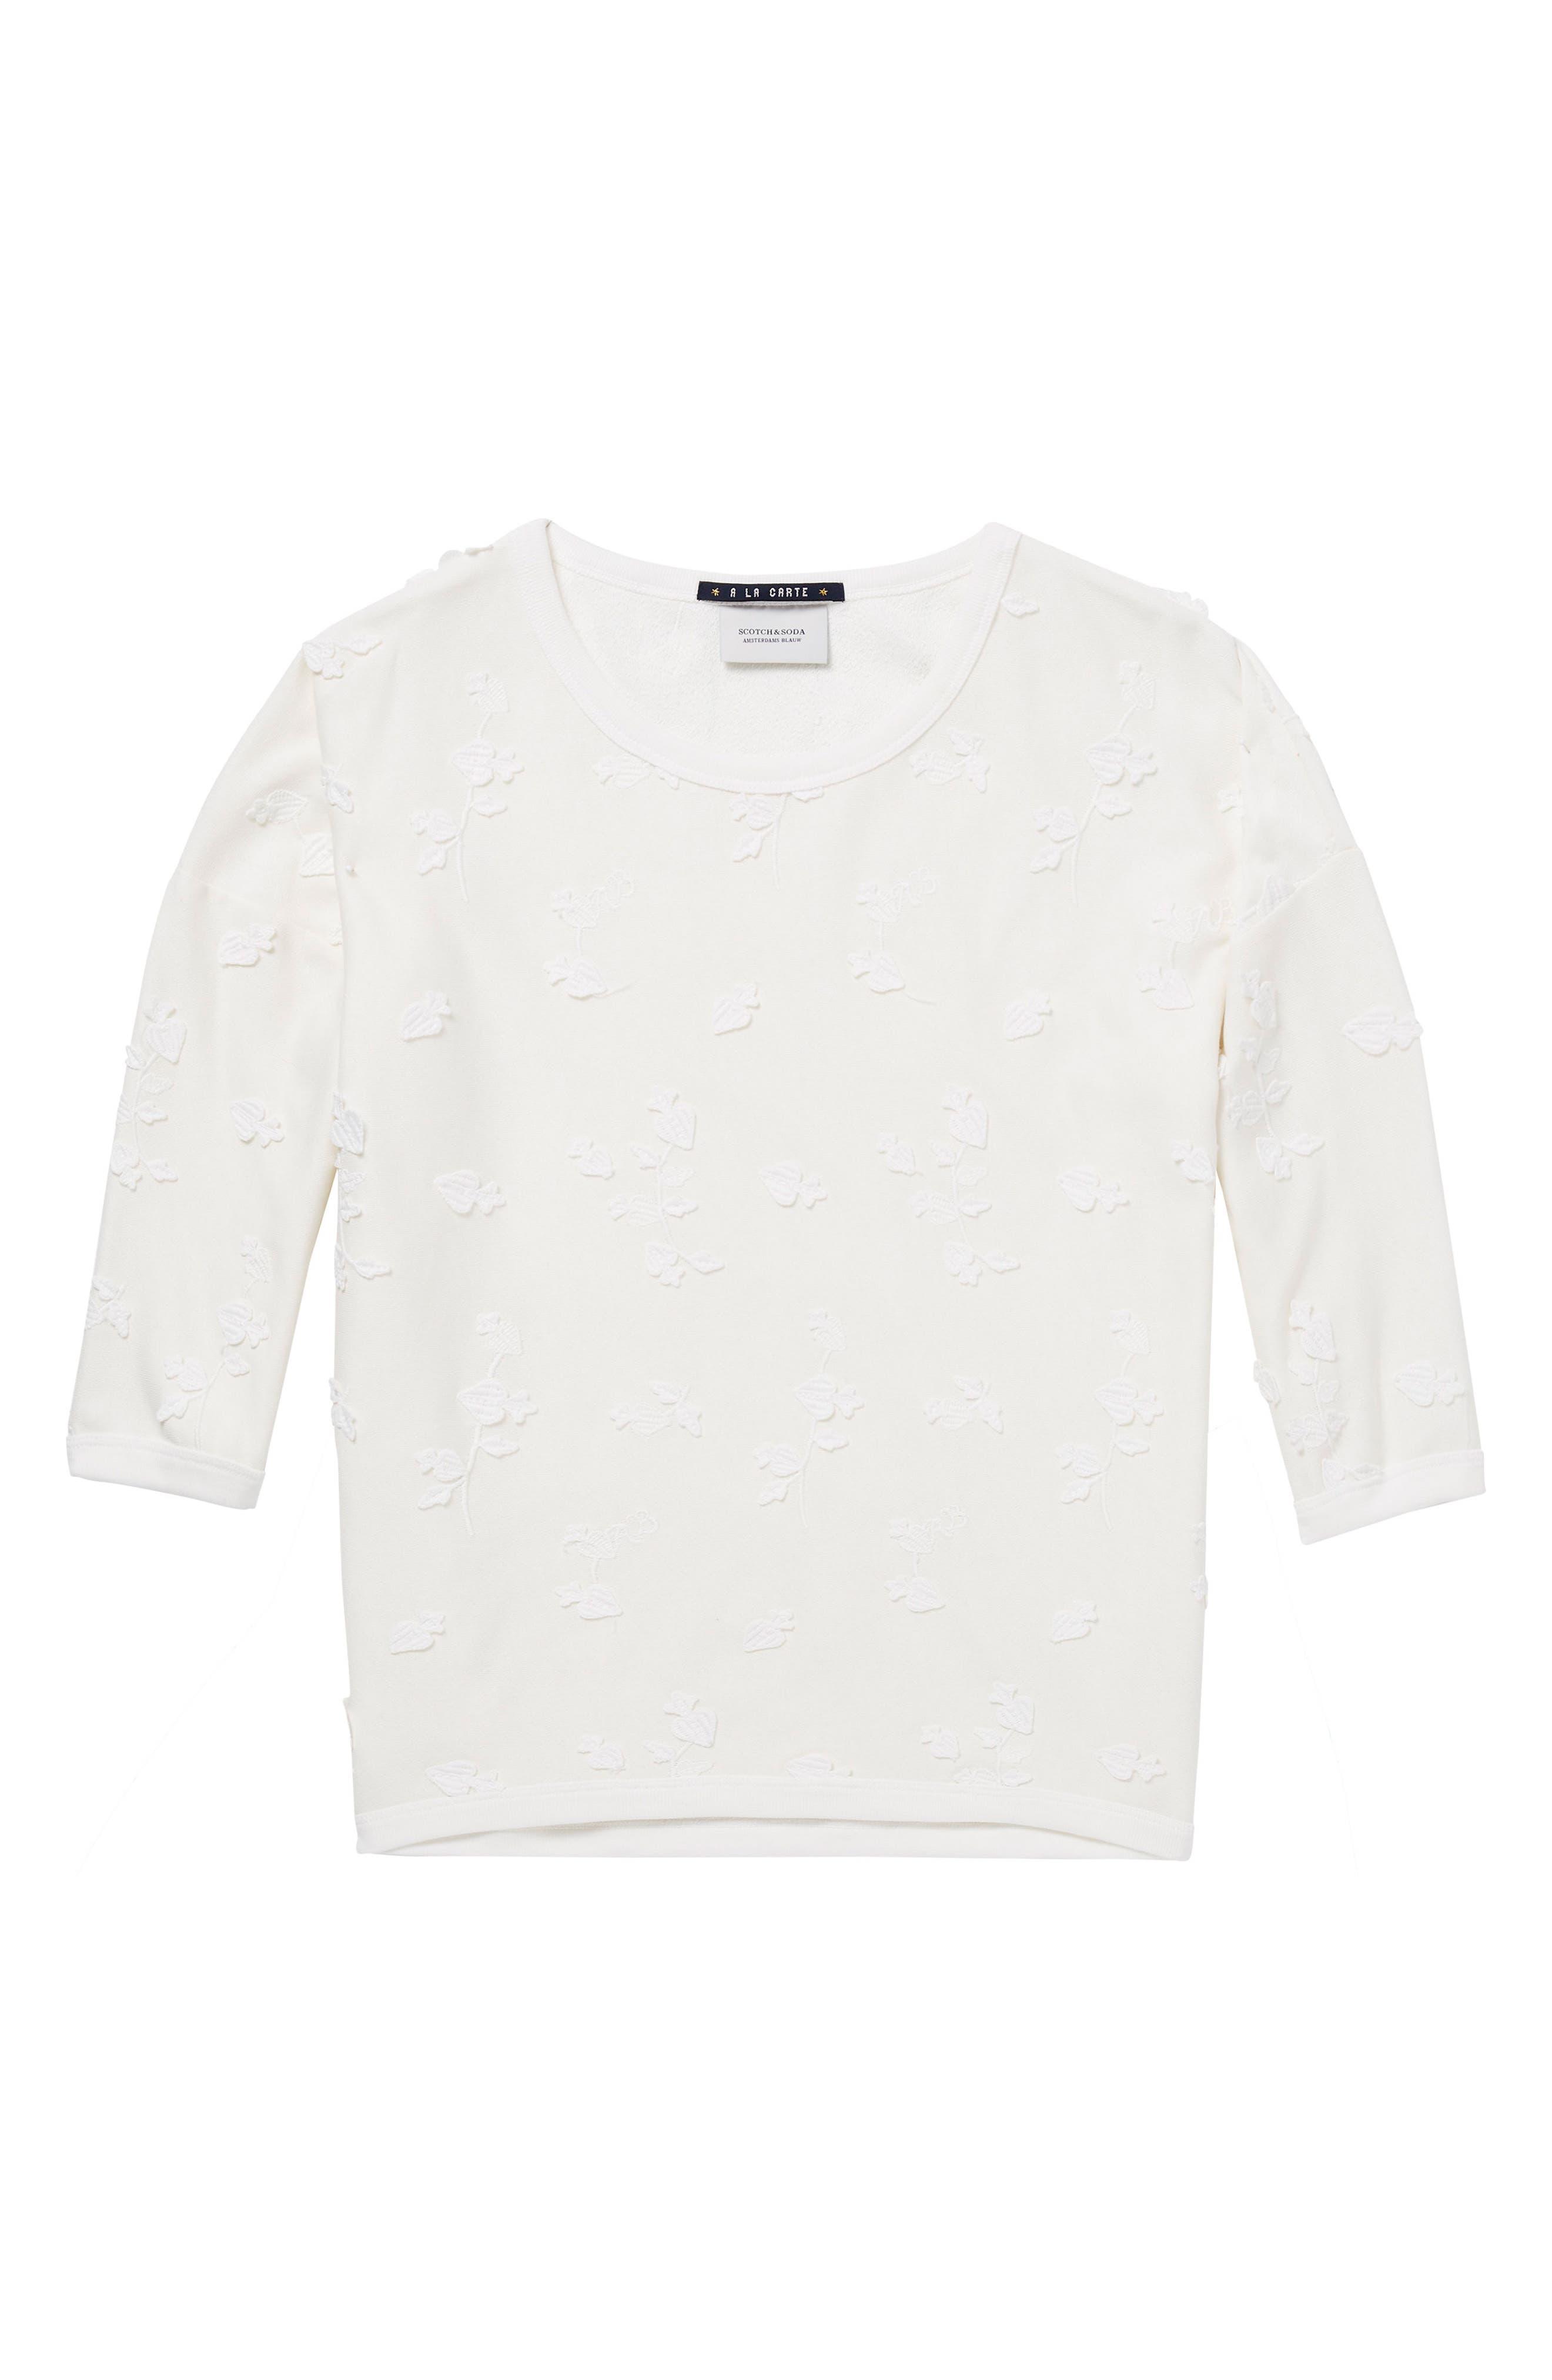 Tonal Embroidered Sweatshirt,                             Alternate thumbnail 6, color,                             01 Denim White